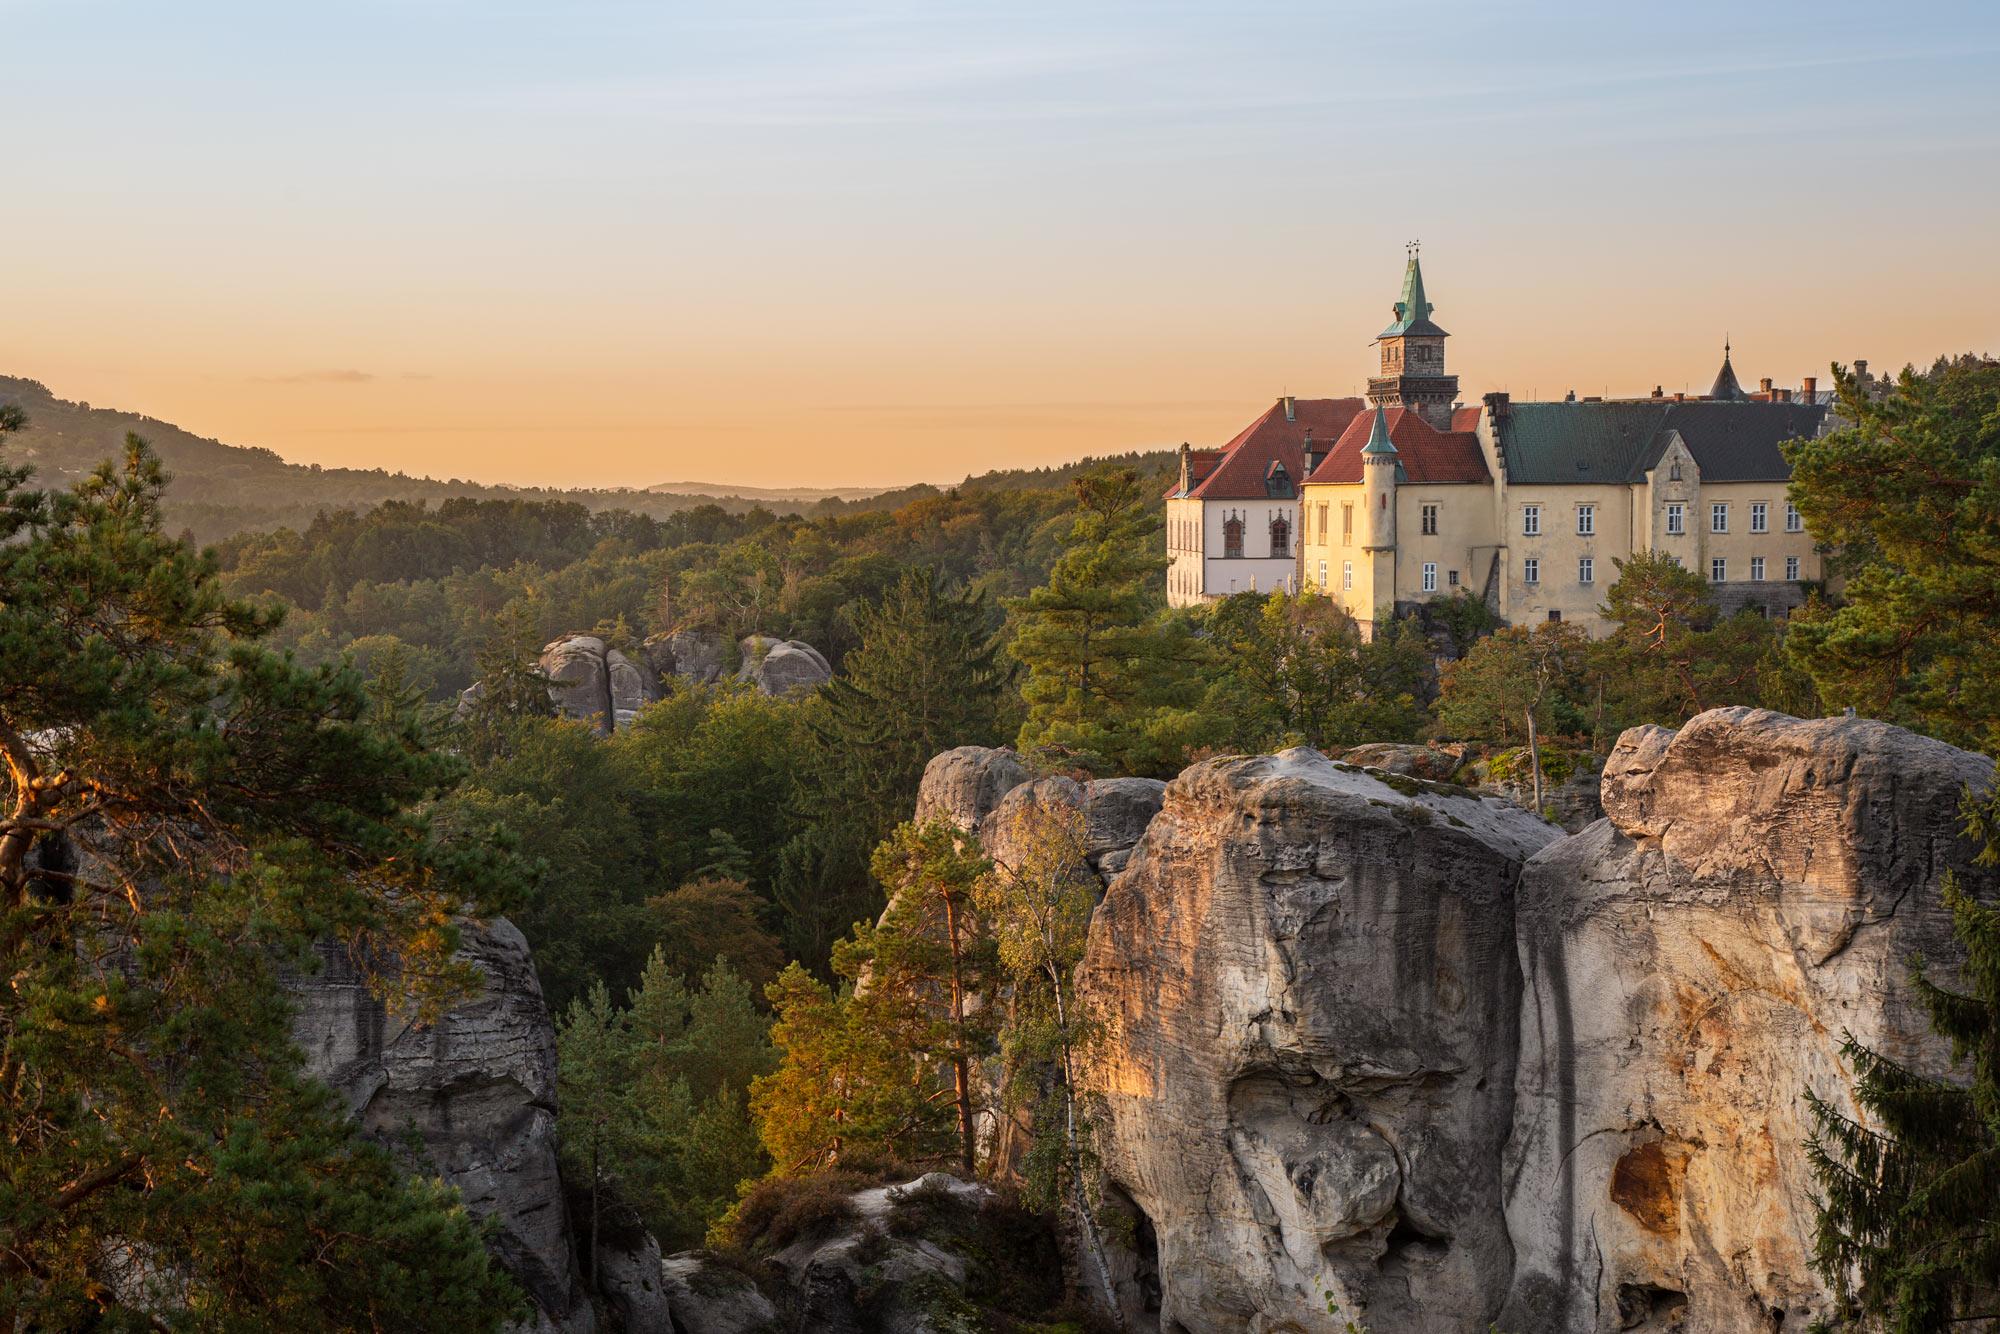 Unique Castle Hotel – Swiss Hotel Photographer shooting worldwideAdrian Kilchherr